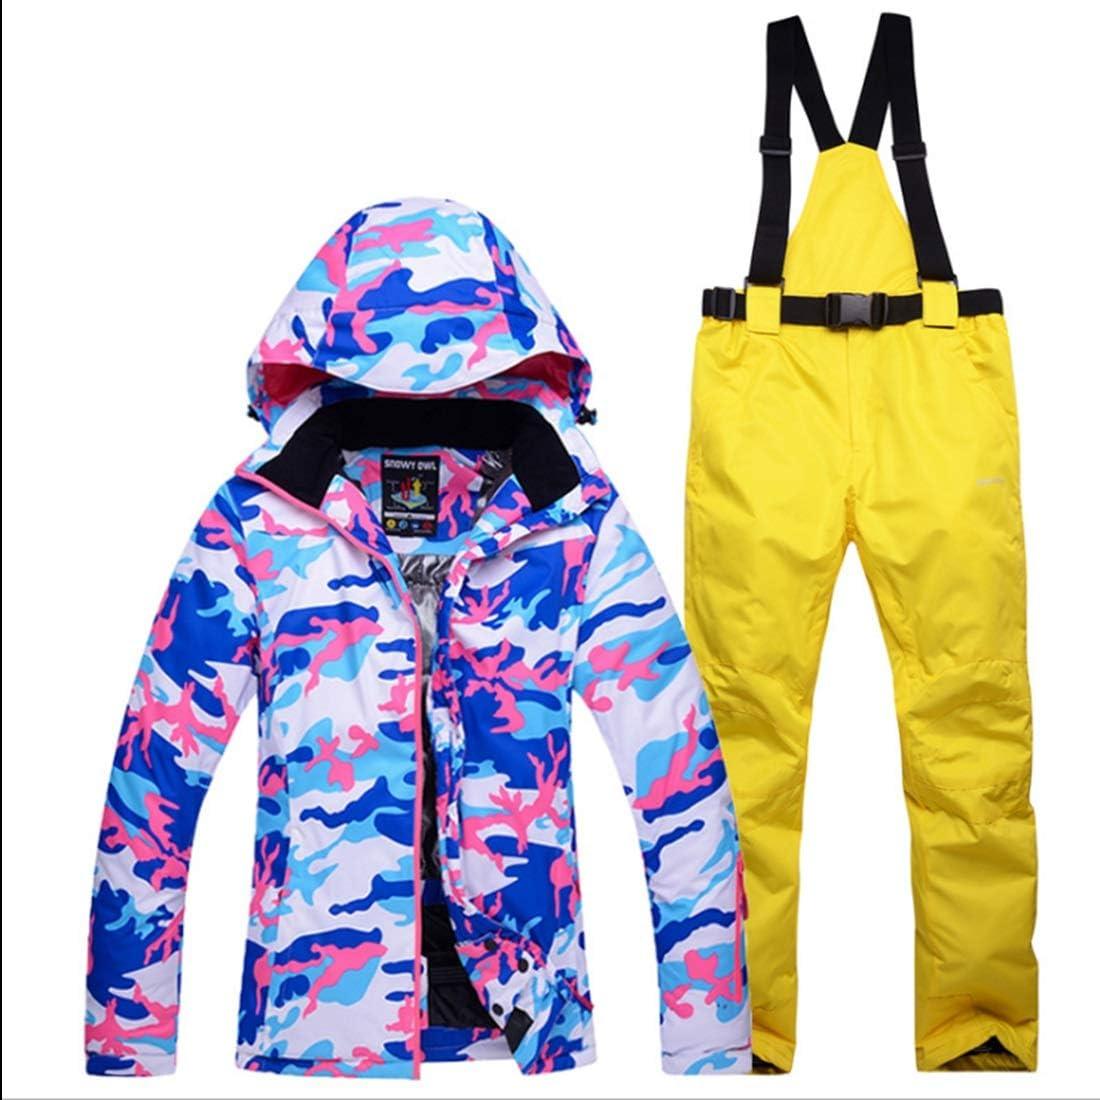 Makecny 女性のマウンテンスキージャケット防水防風暖かい冬のレインコート (色 : 02, サイズ : L)  Large